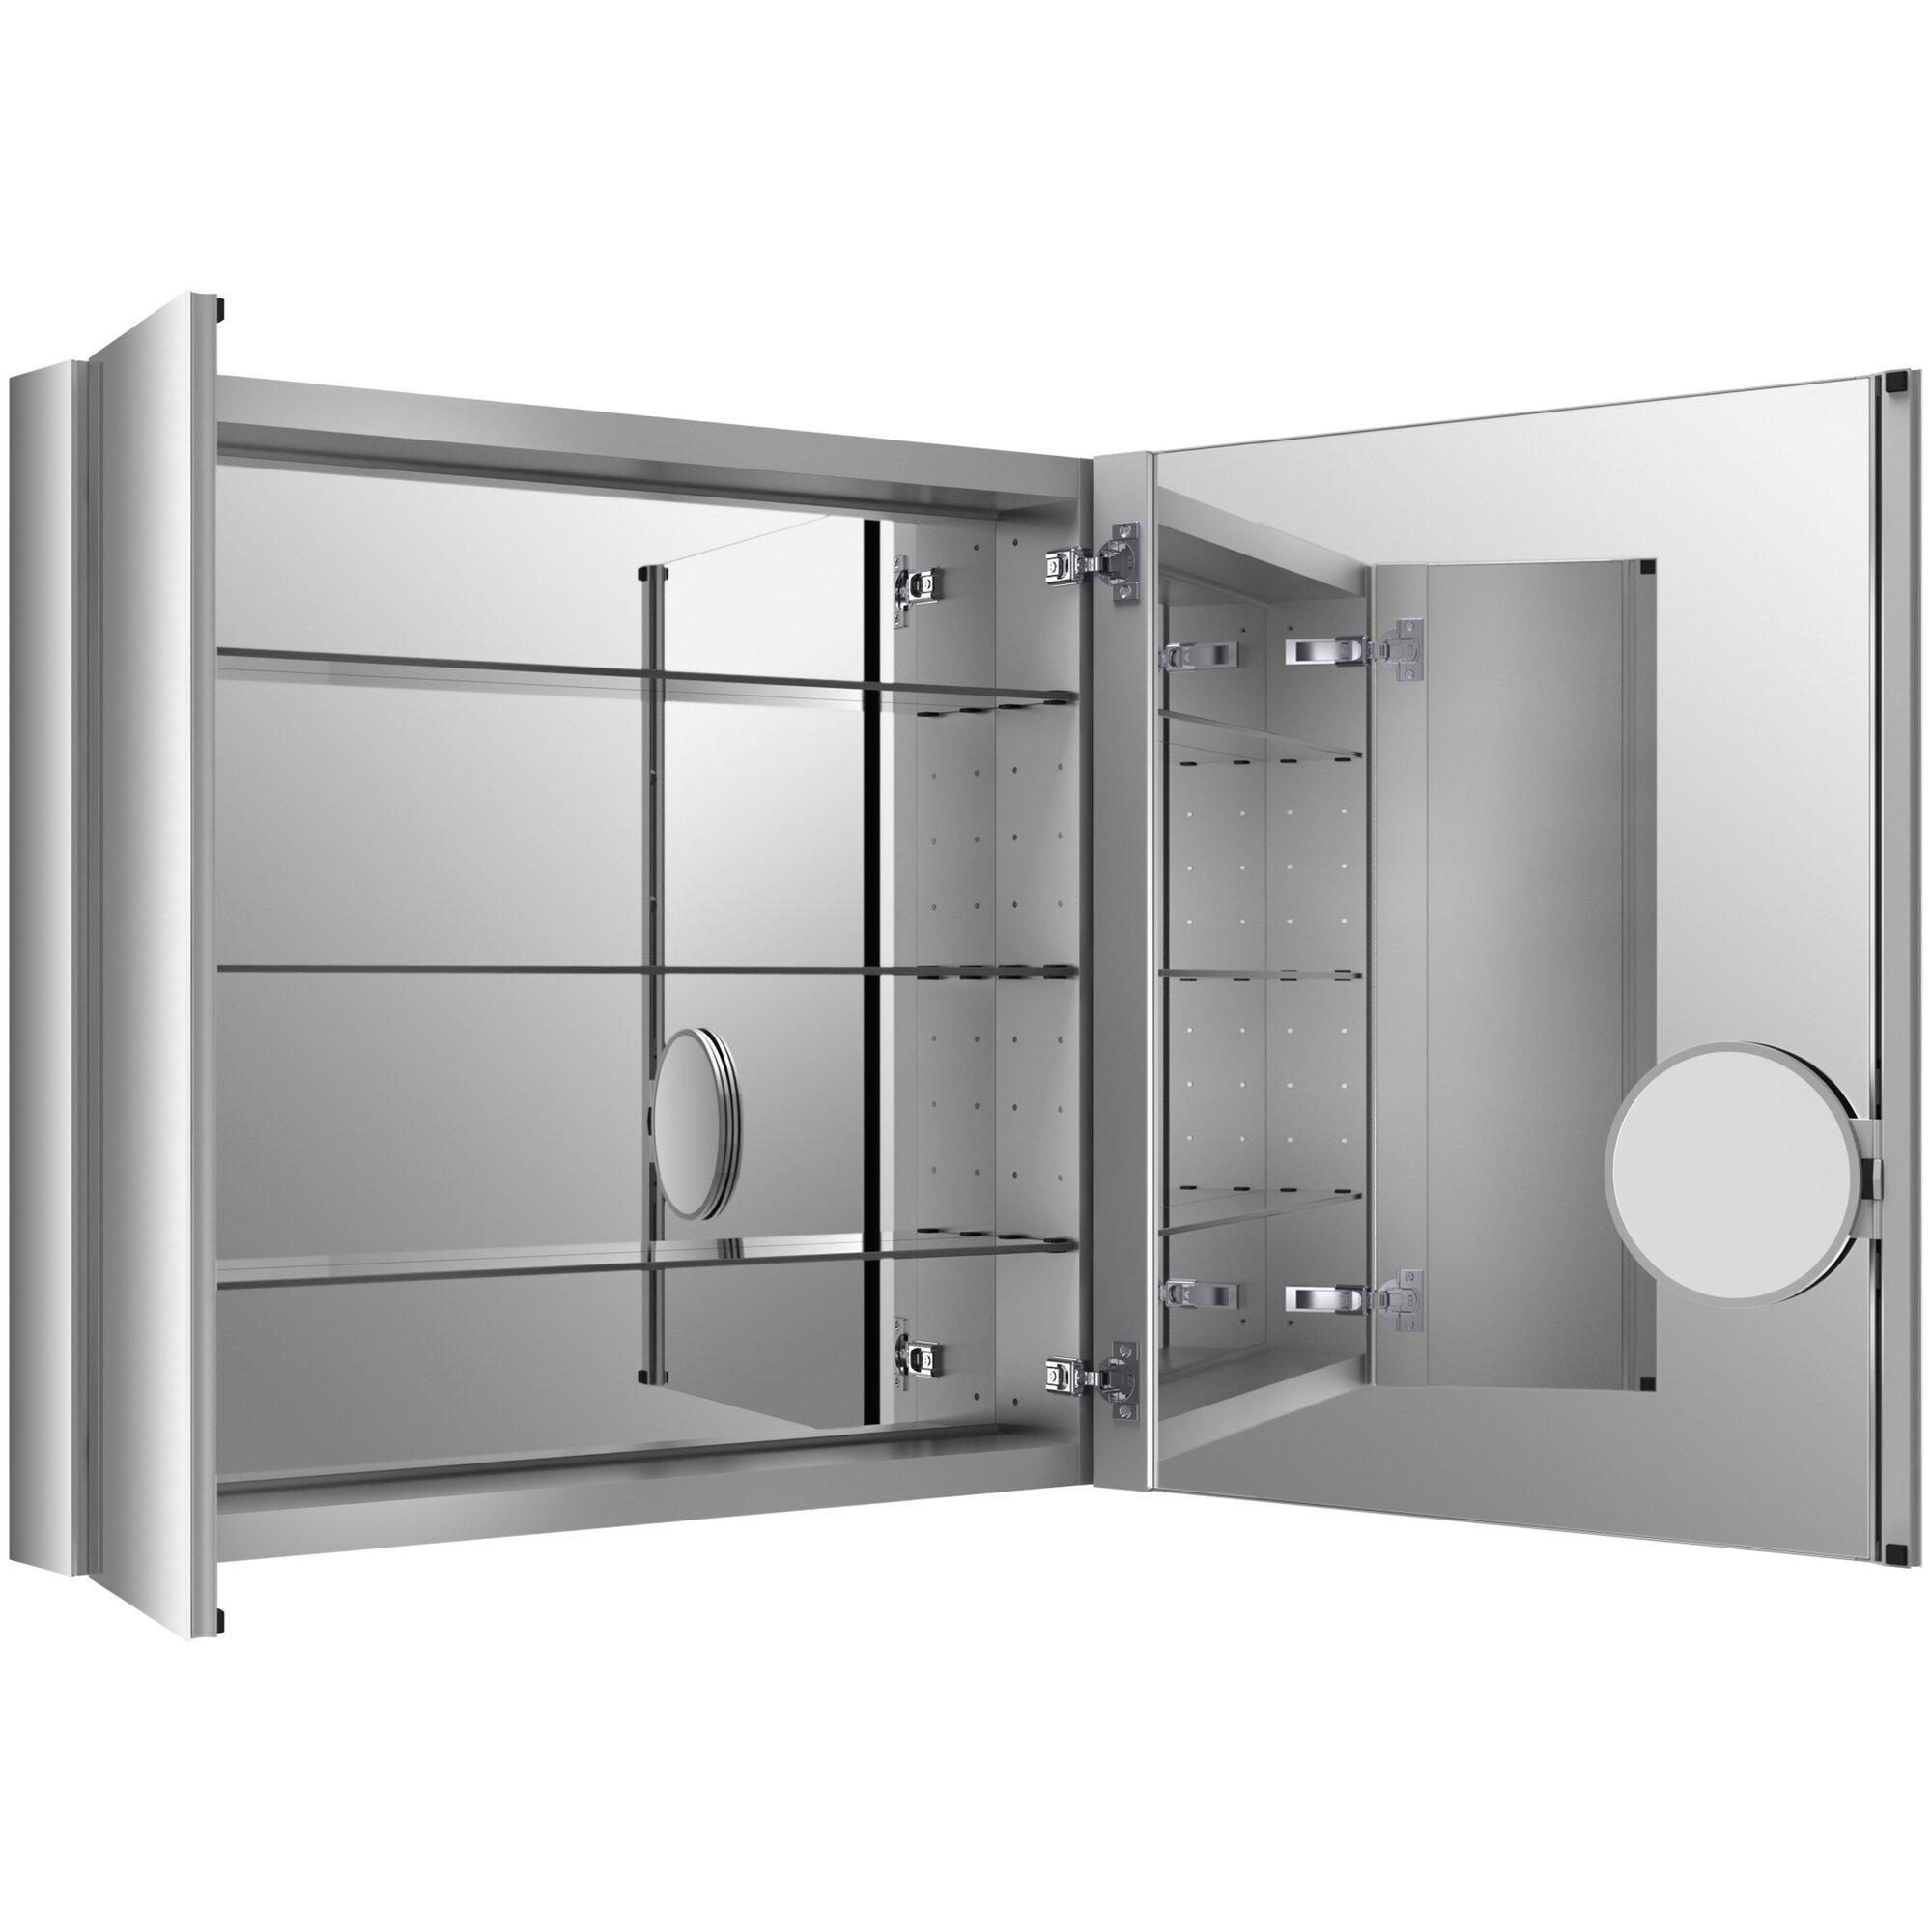 kohler verdera 34 w x 30 h aluminum medicine cabinet with adjustable magnifying mirror and. Black Bedroom Furniture Sets. Home Design Ideas